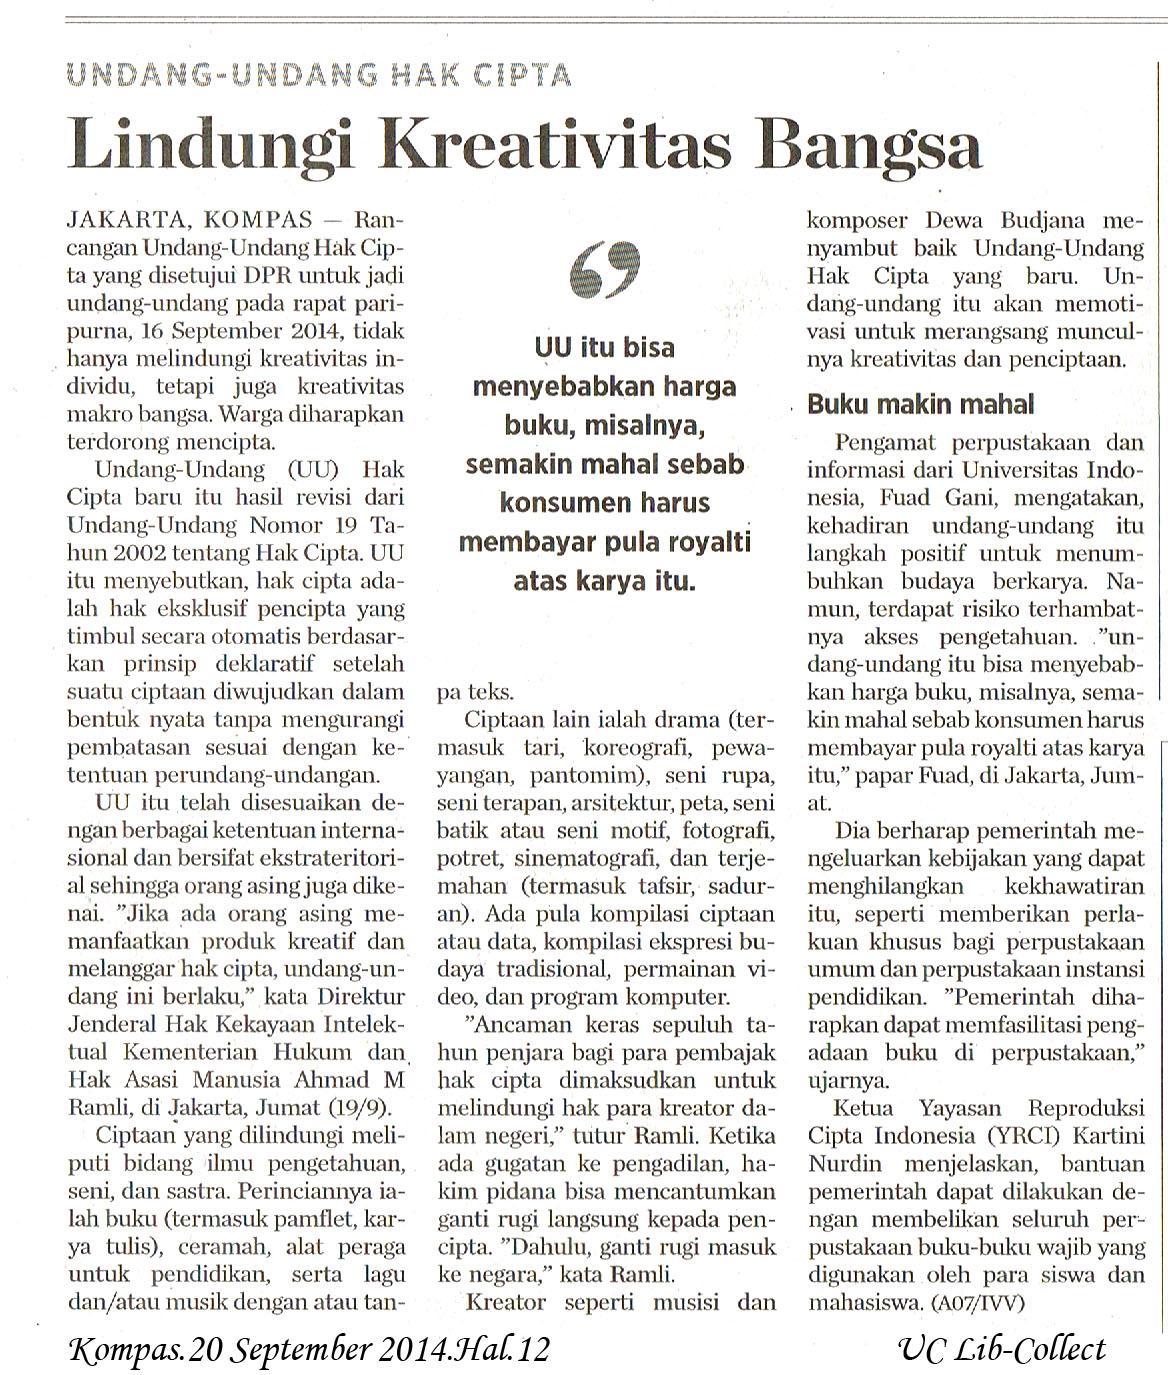 Lindungi Kreativitas Bangsa.Kompas.20 September 2014.Hal.12